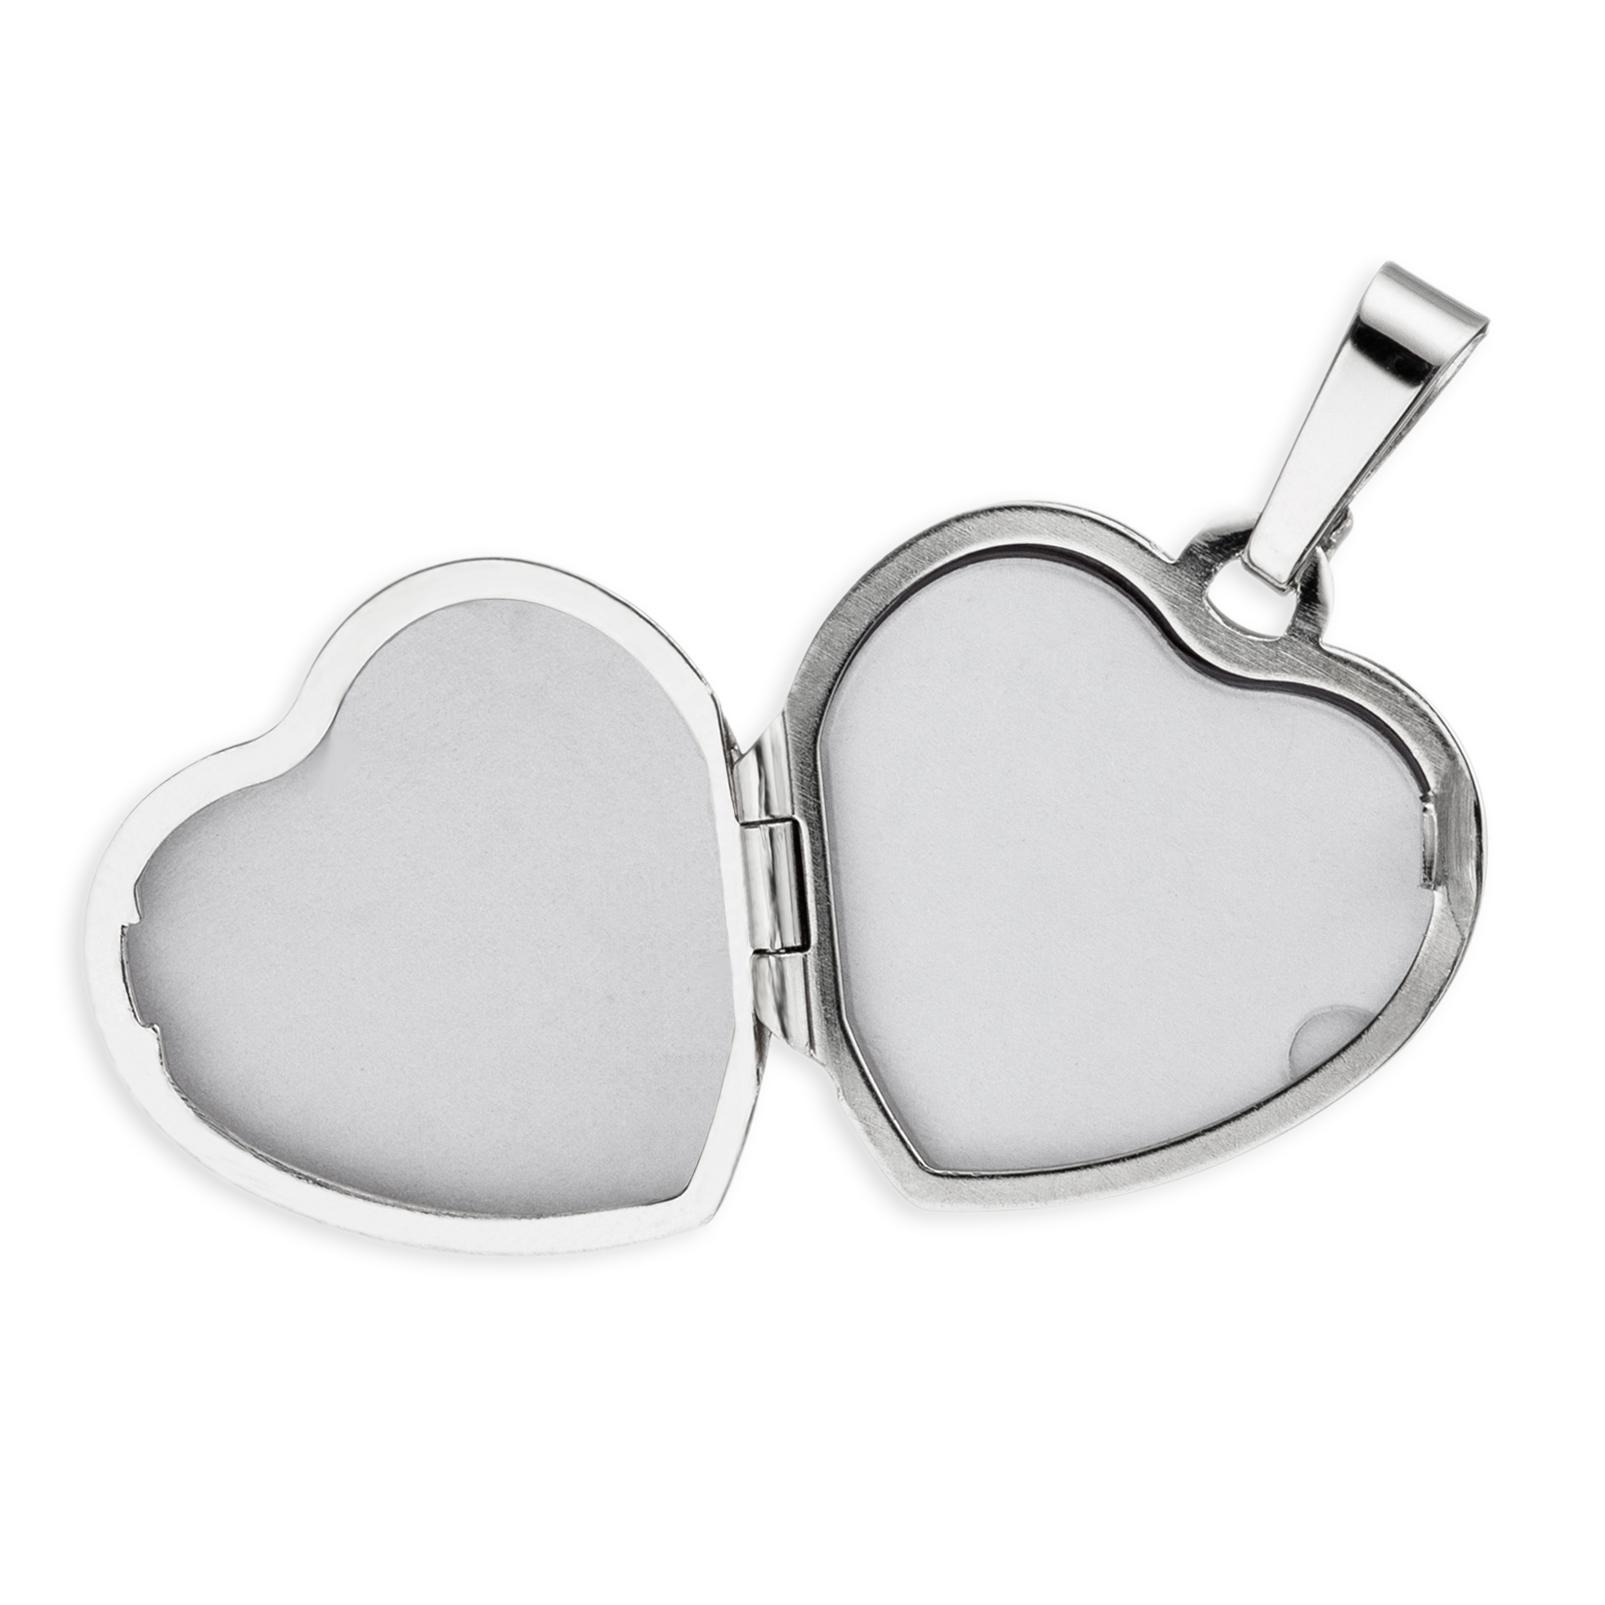 Medaillon Doppelmedaillon Herz hochglanz 925 Sterling Silber für  4 Fotos